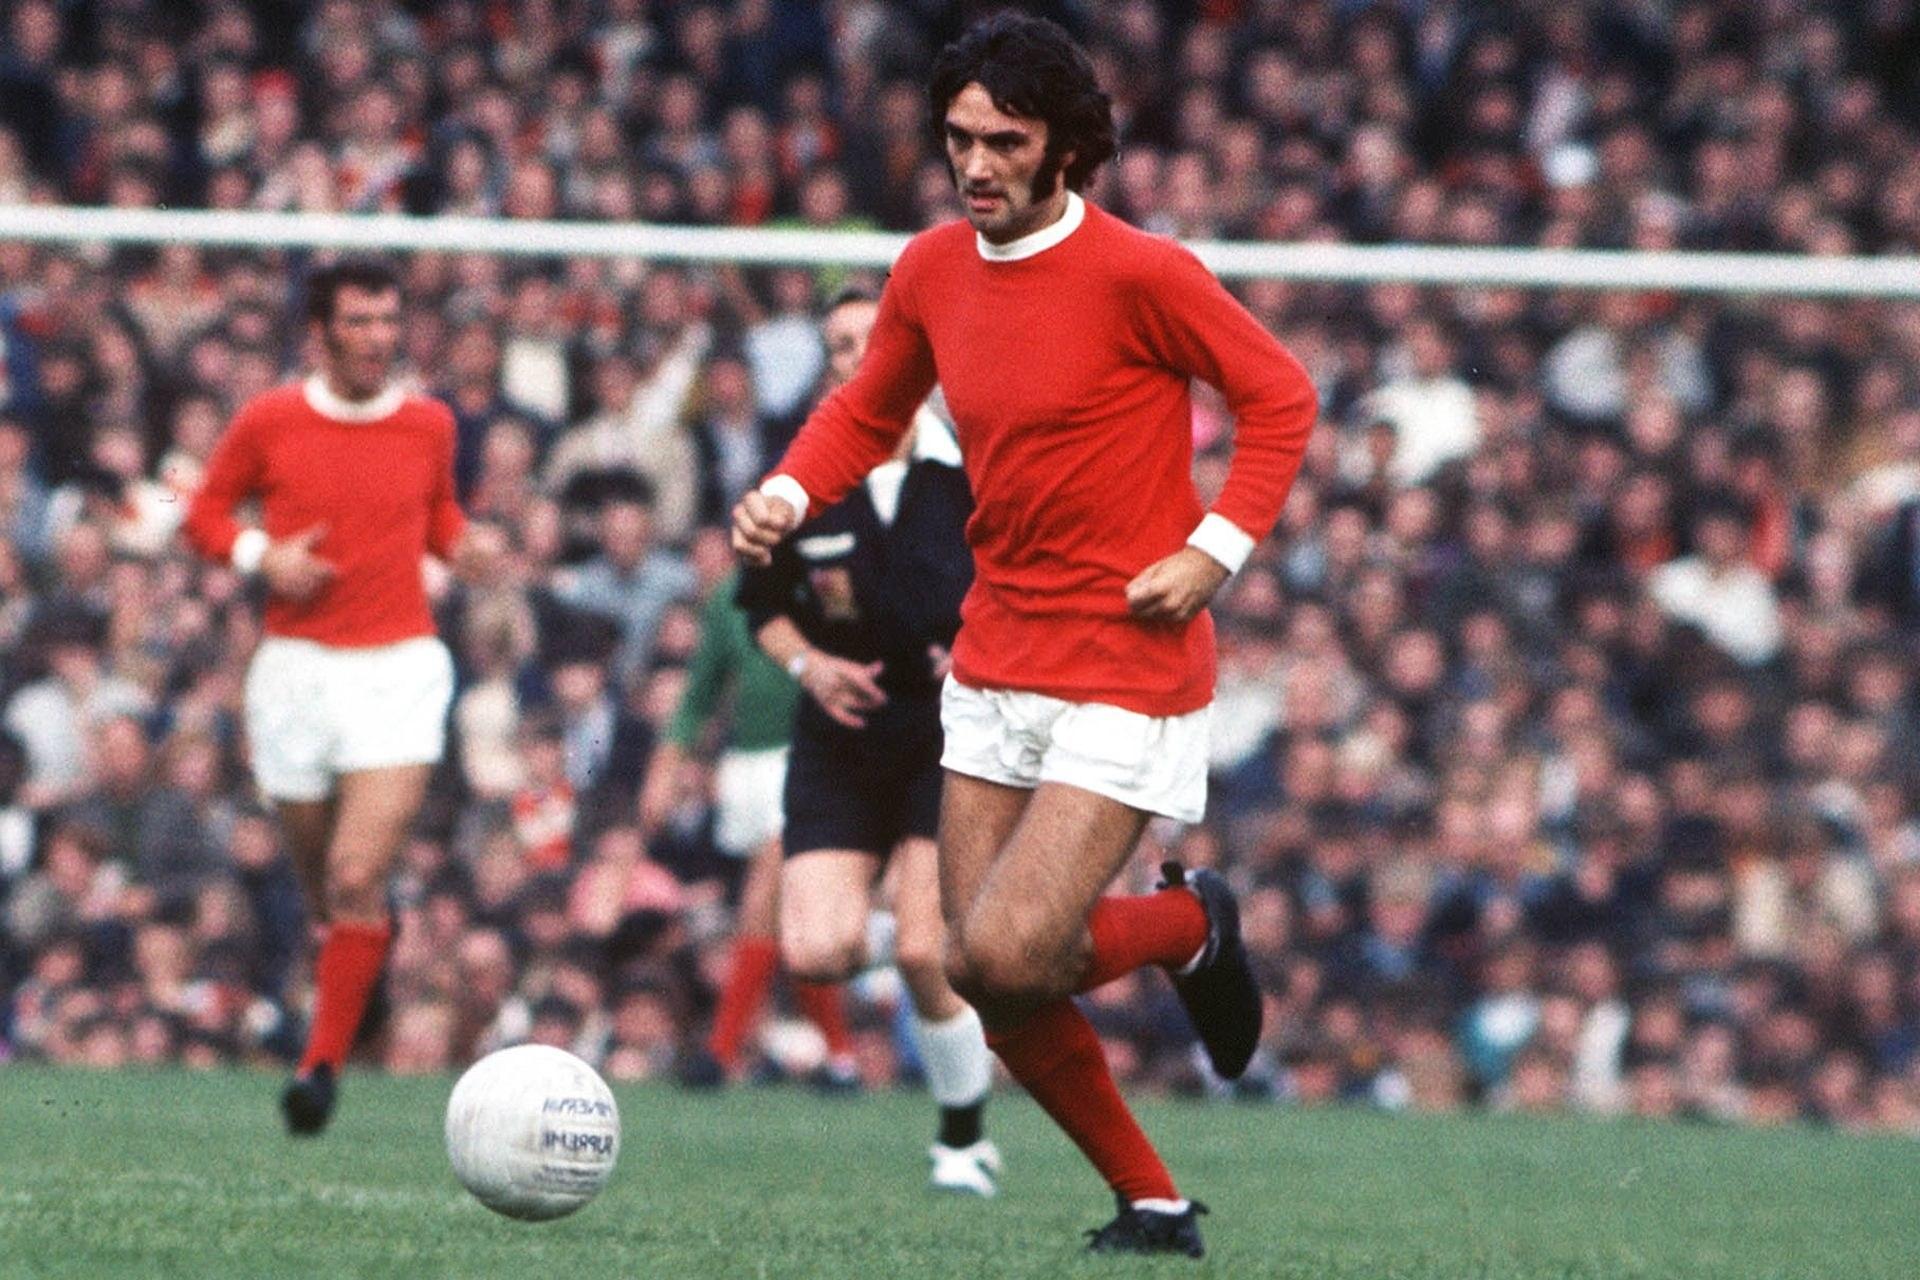 George Best danFerenc Puskas Pemain Sepakbola Hebat Dan Belum Pernah Menjuarai Piala Dunia